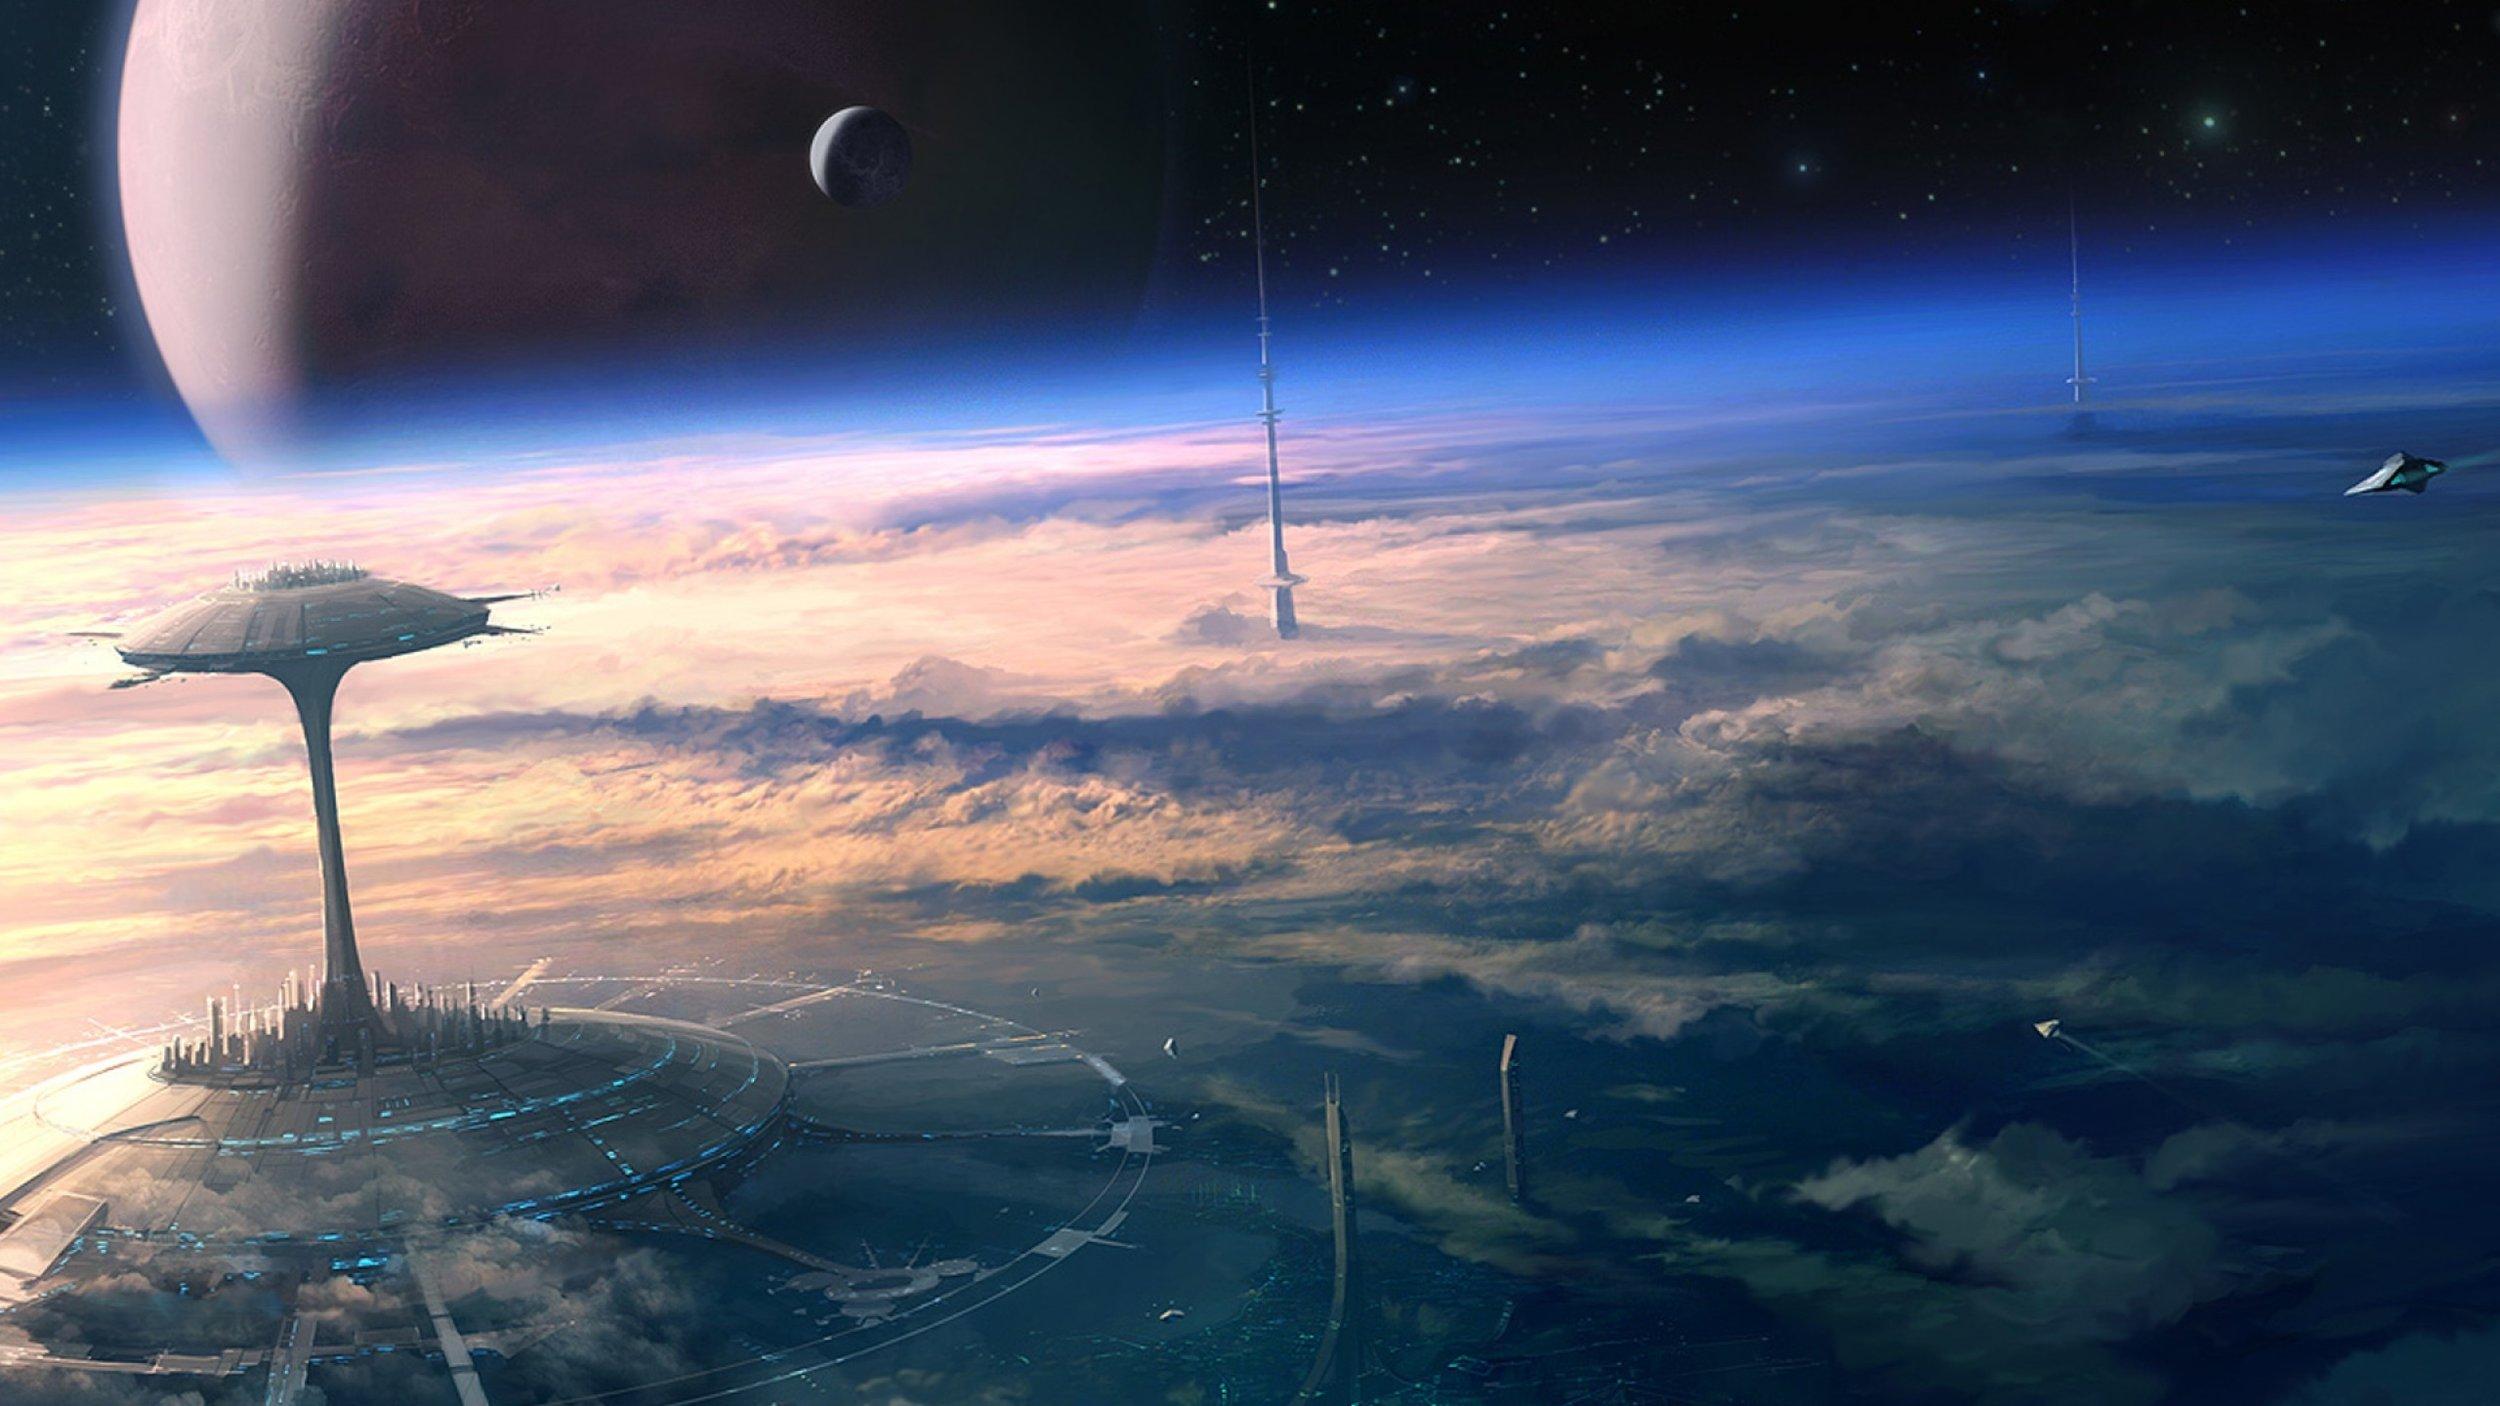 1037823-top-sci-fi-fantasy-wallpaper-2560x1440-pc.jpg